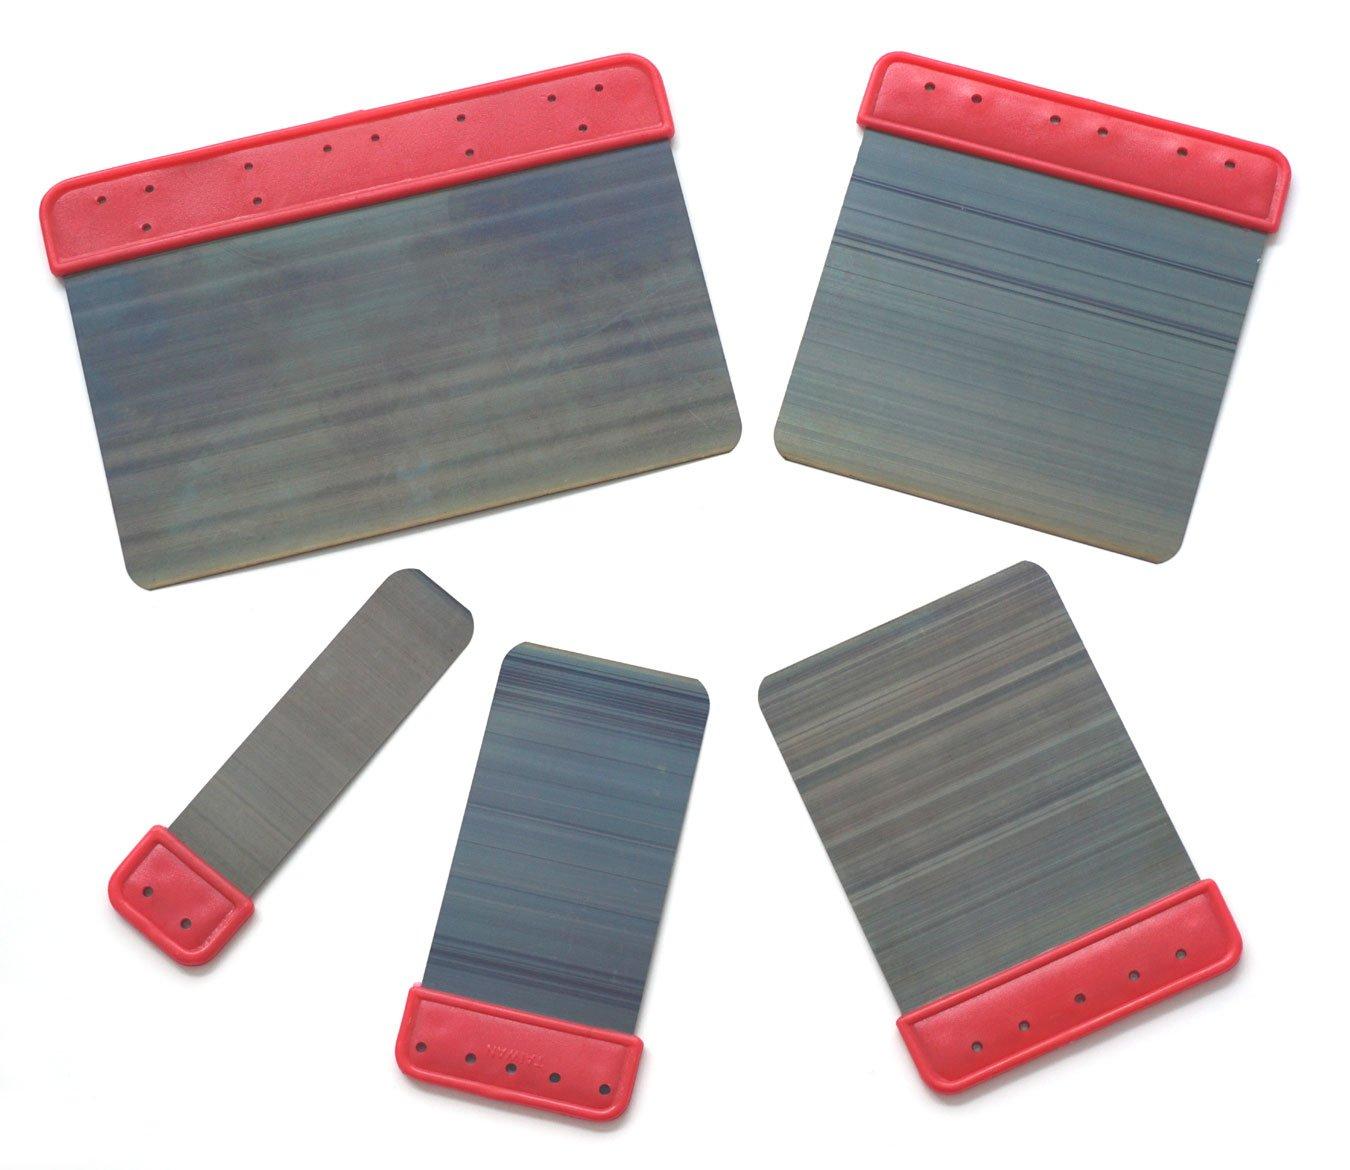 Set of Five Blued Steel Blade Spatulas Sizes: 6'', 4'', 3'', 2'', 1''